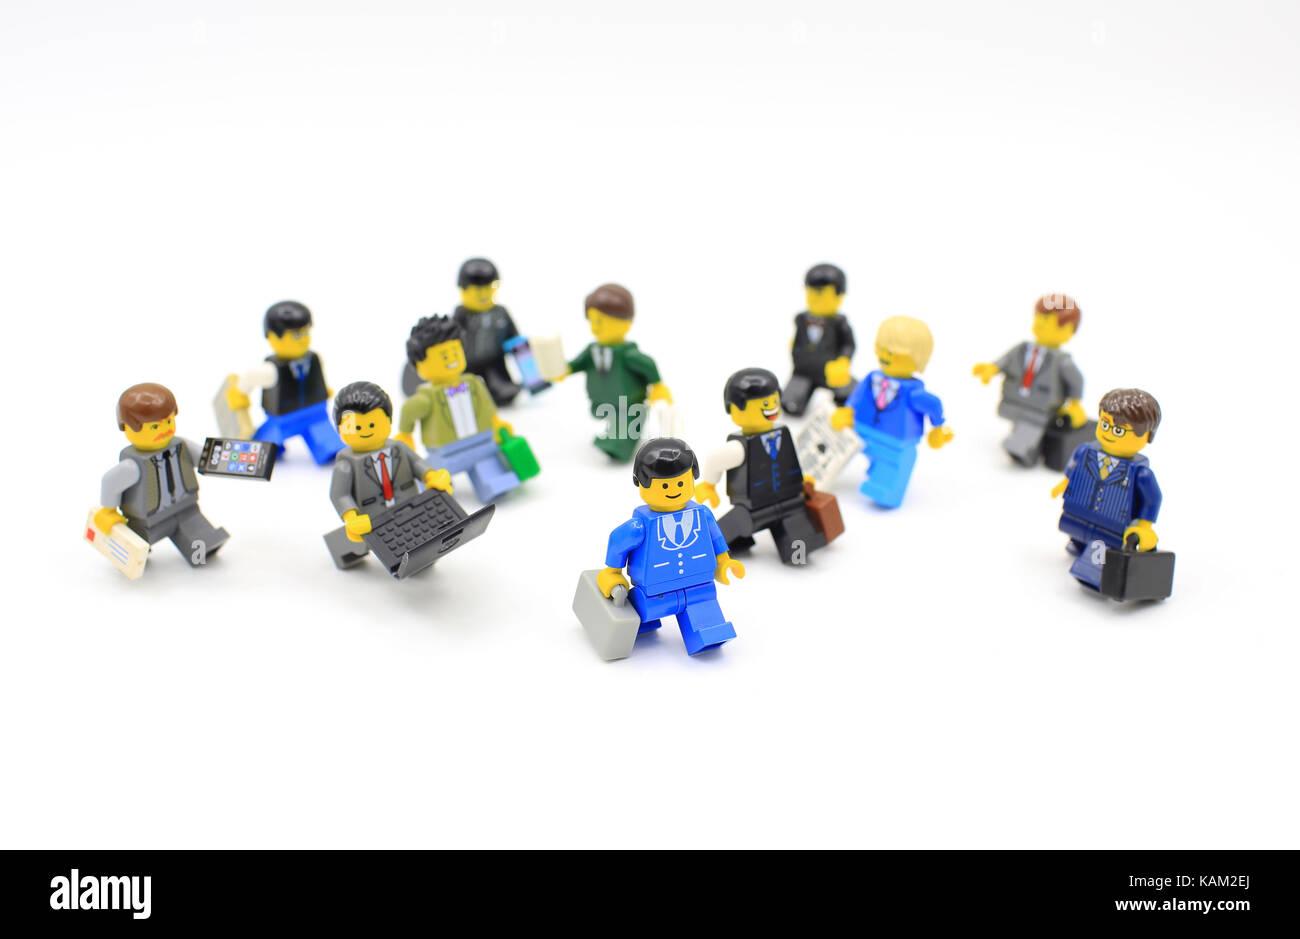 job seeking - Stock Image